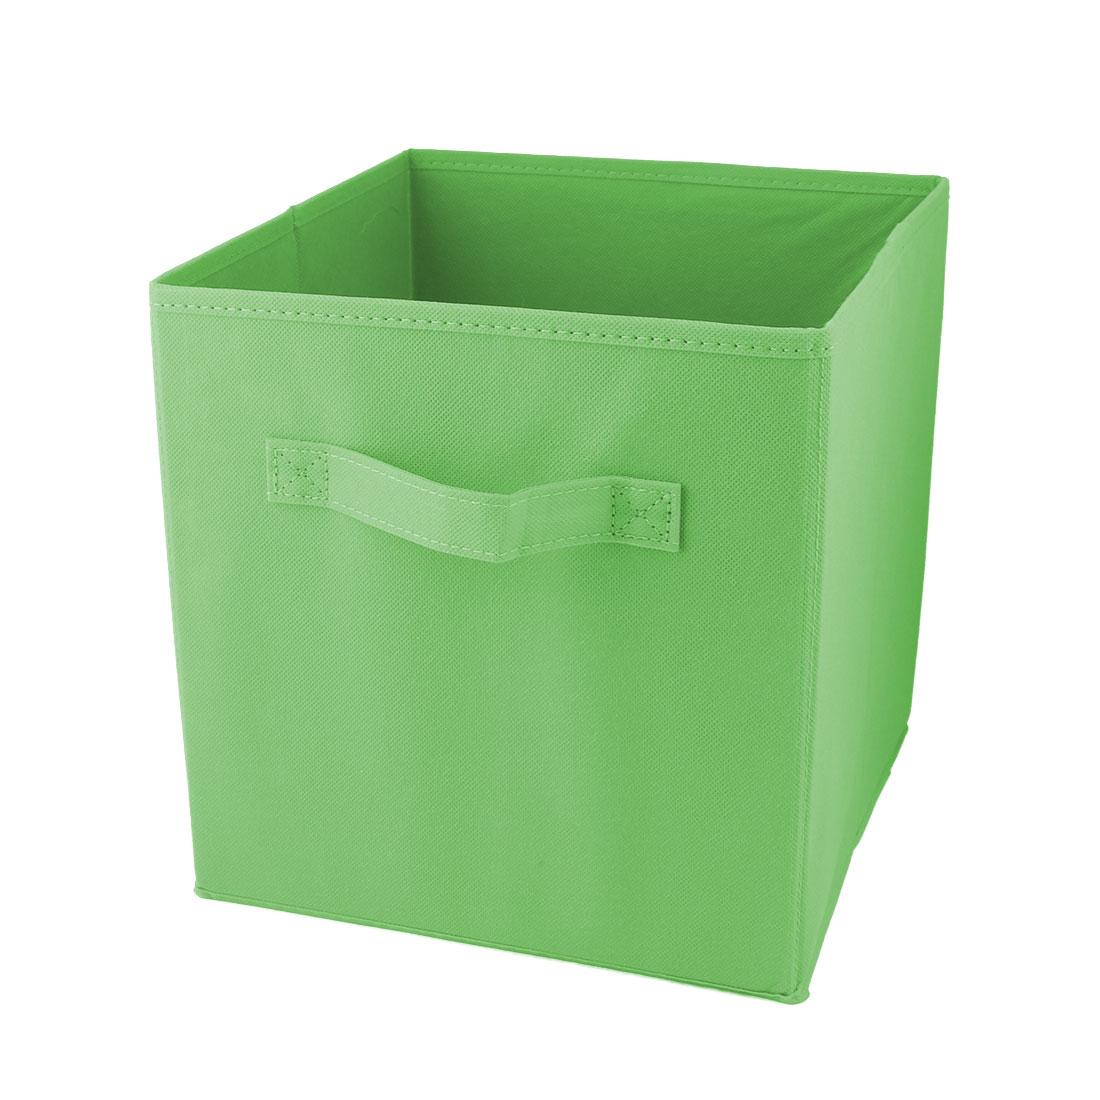 Apartment Non-woven Fabric Foldable Books Cosmetics Holder Storage Box Green